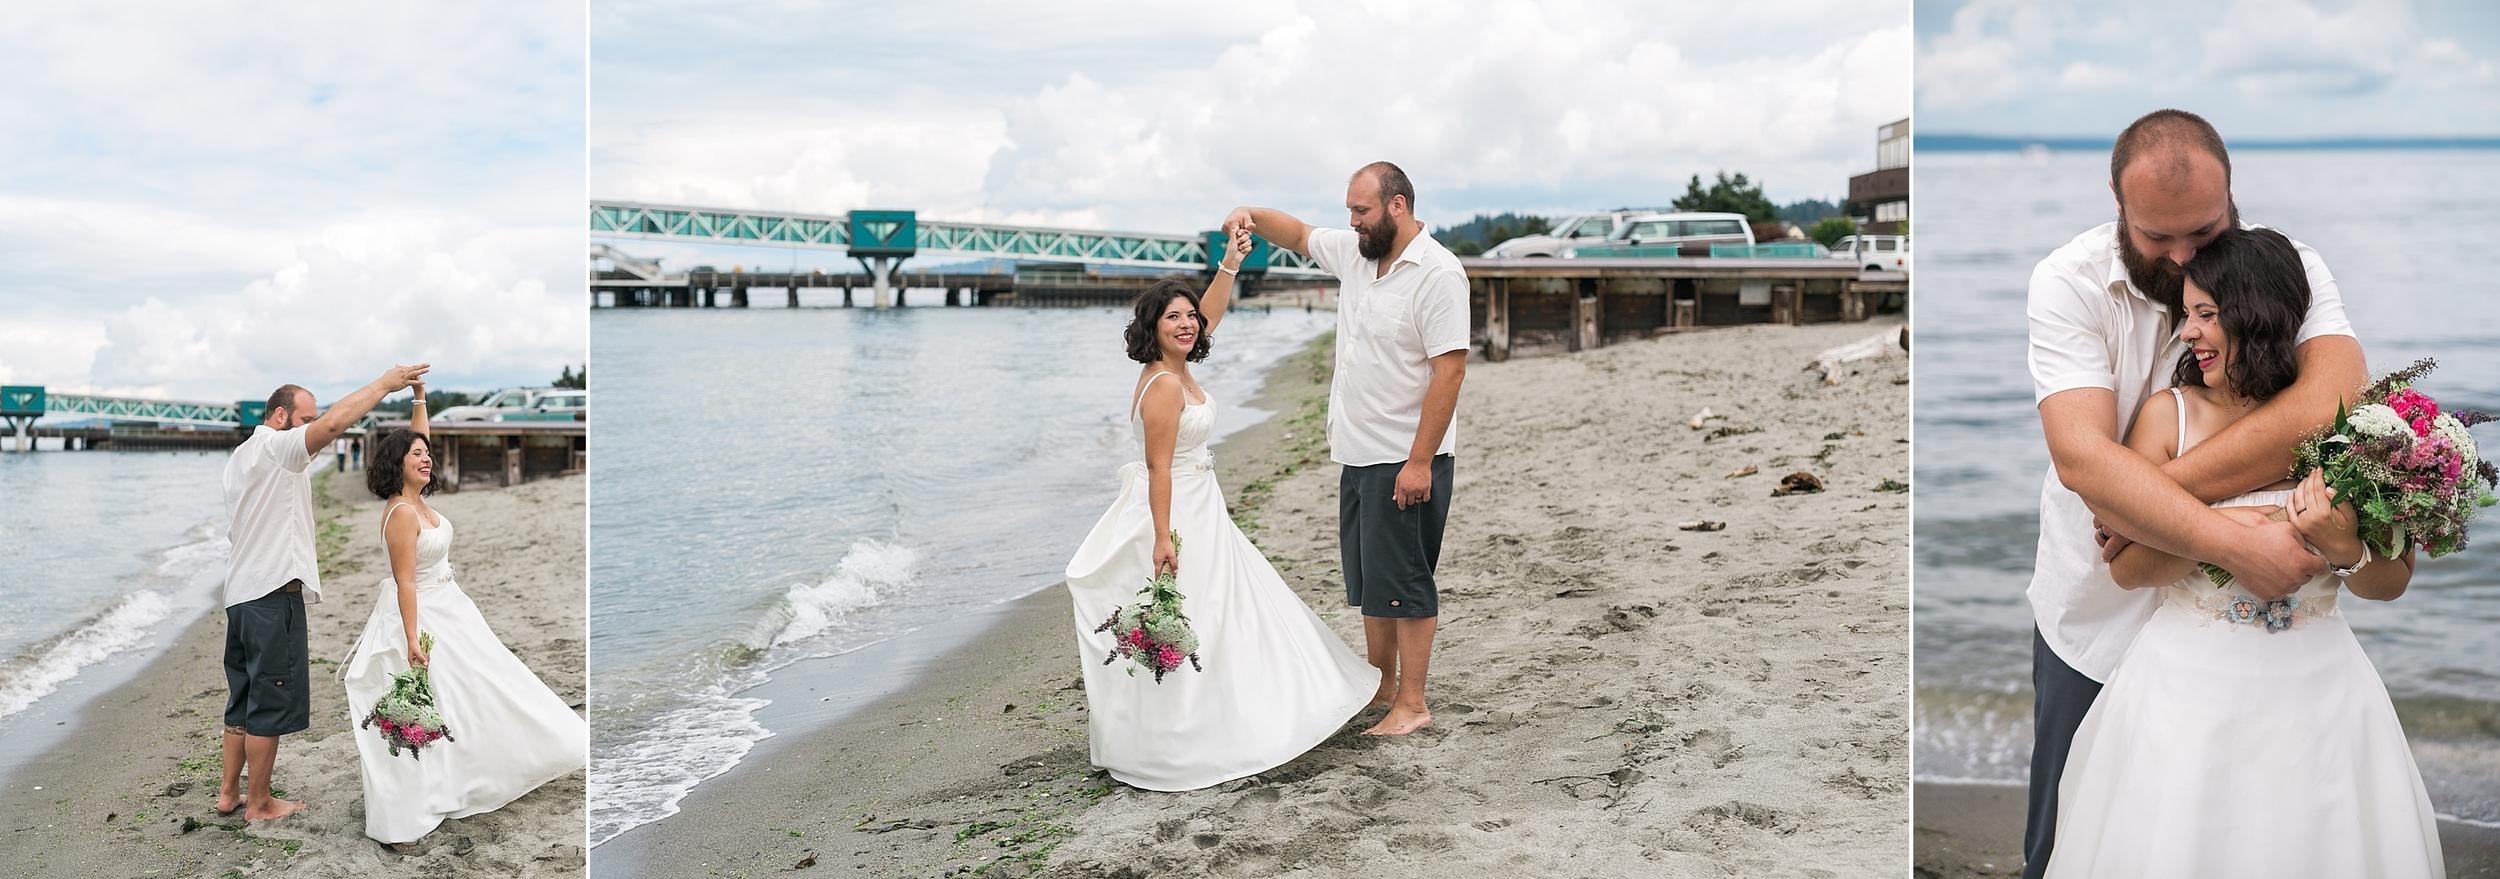 ashley vos photography seattle area wedding photographer_0635.jpg